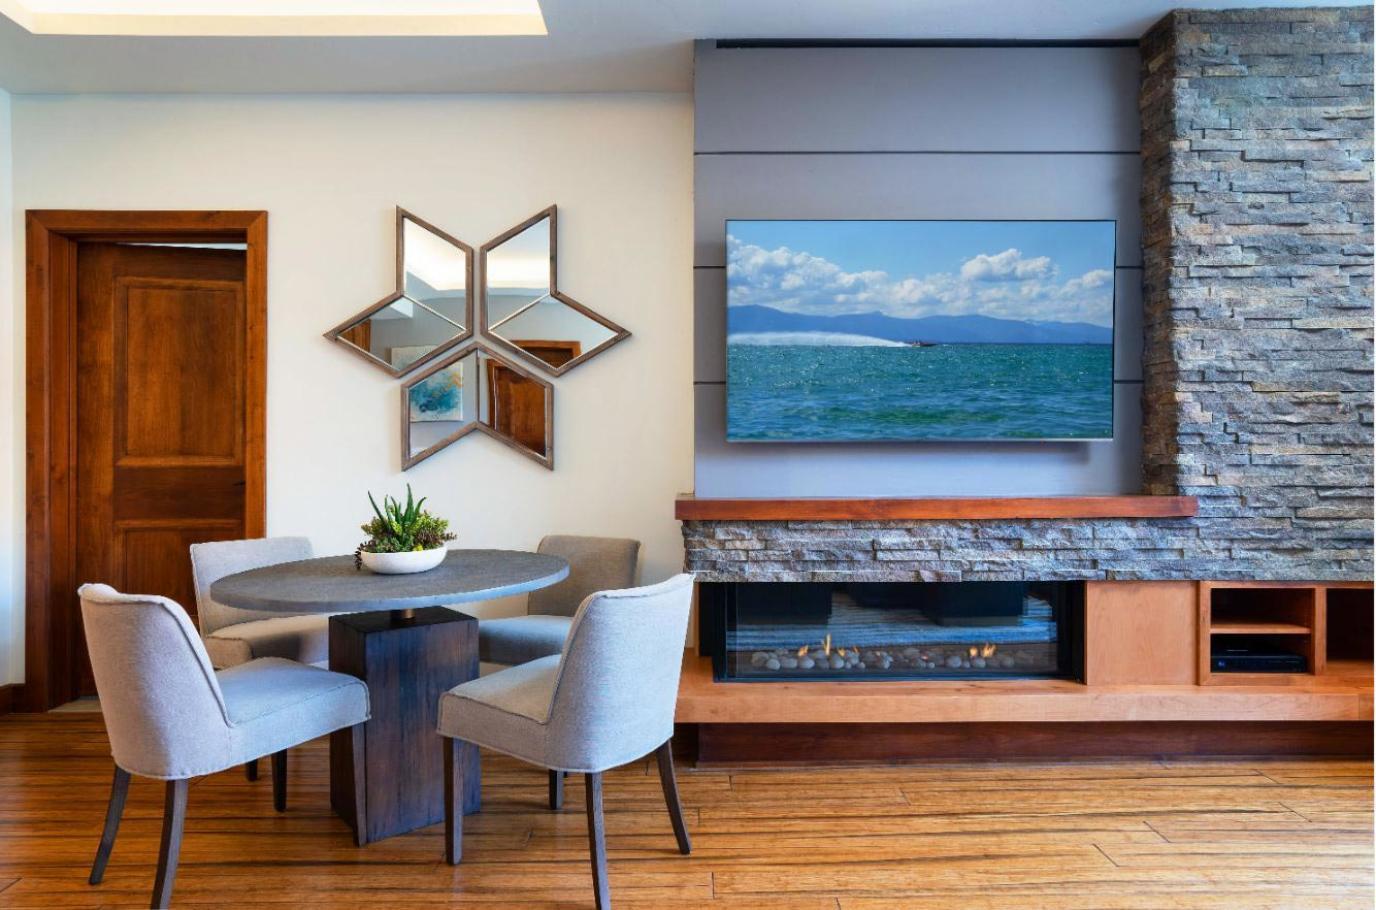 Zalanta Dining Area Design by Talie Jane Interiors